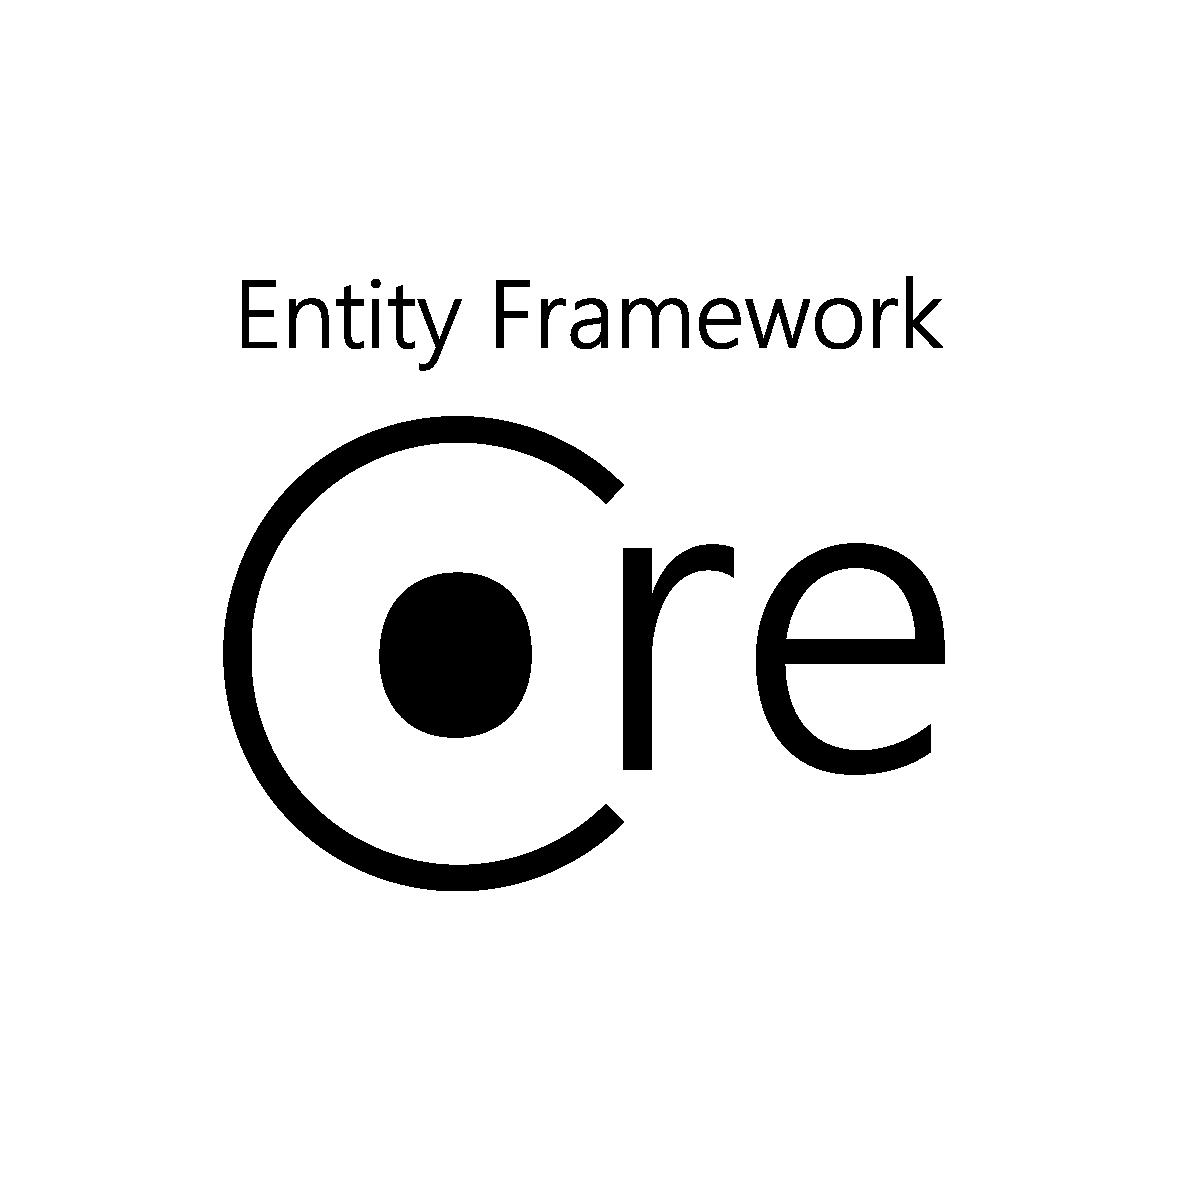 https://raw.githubusercontent.com/campusMVP/dotnetCoreLogoPack/master/Entity%20Framework%20Core/Bitmap%20RGB/Bitmap-BIG_Entity-Framework-Core-Logo_Black_Square_RGB.png